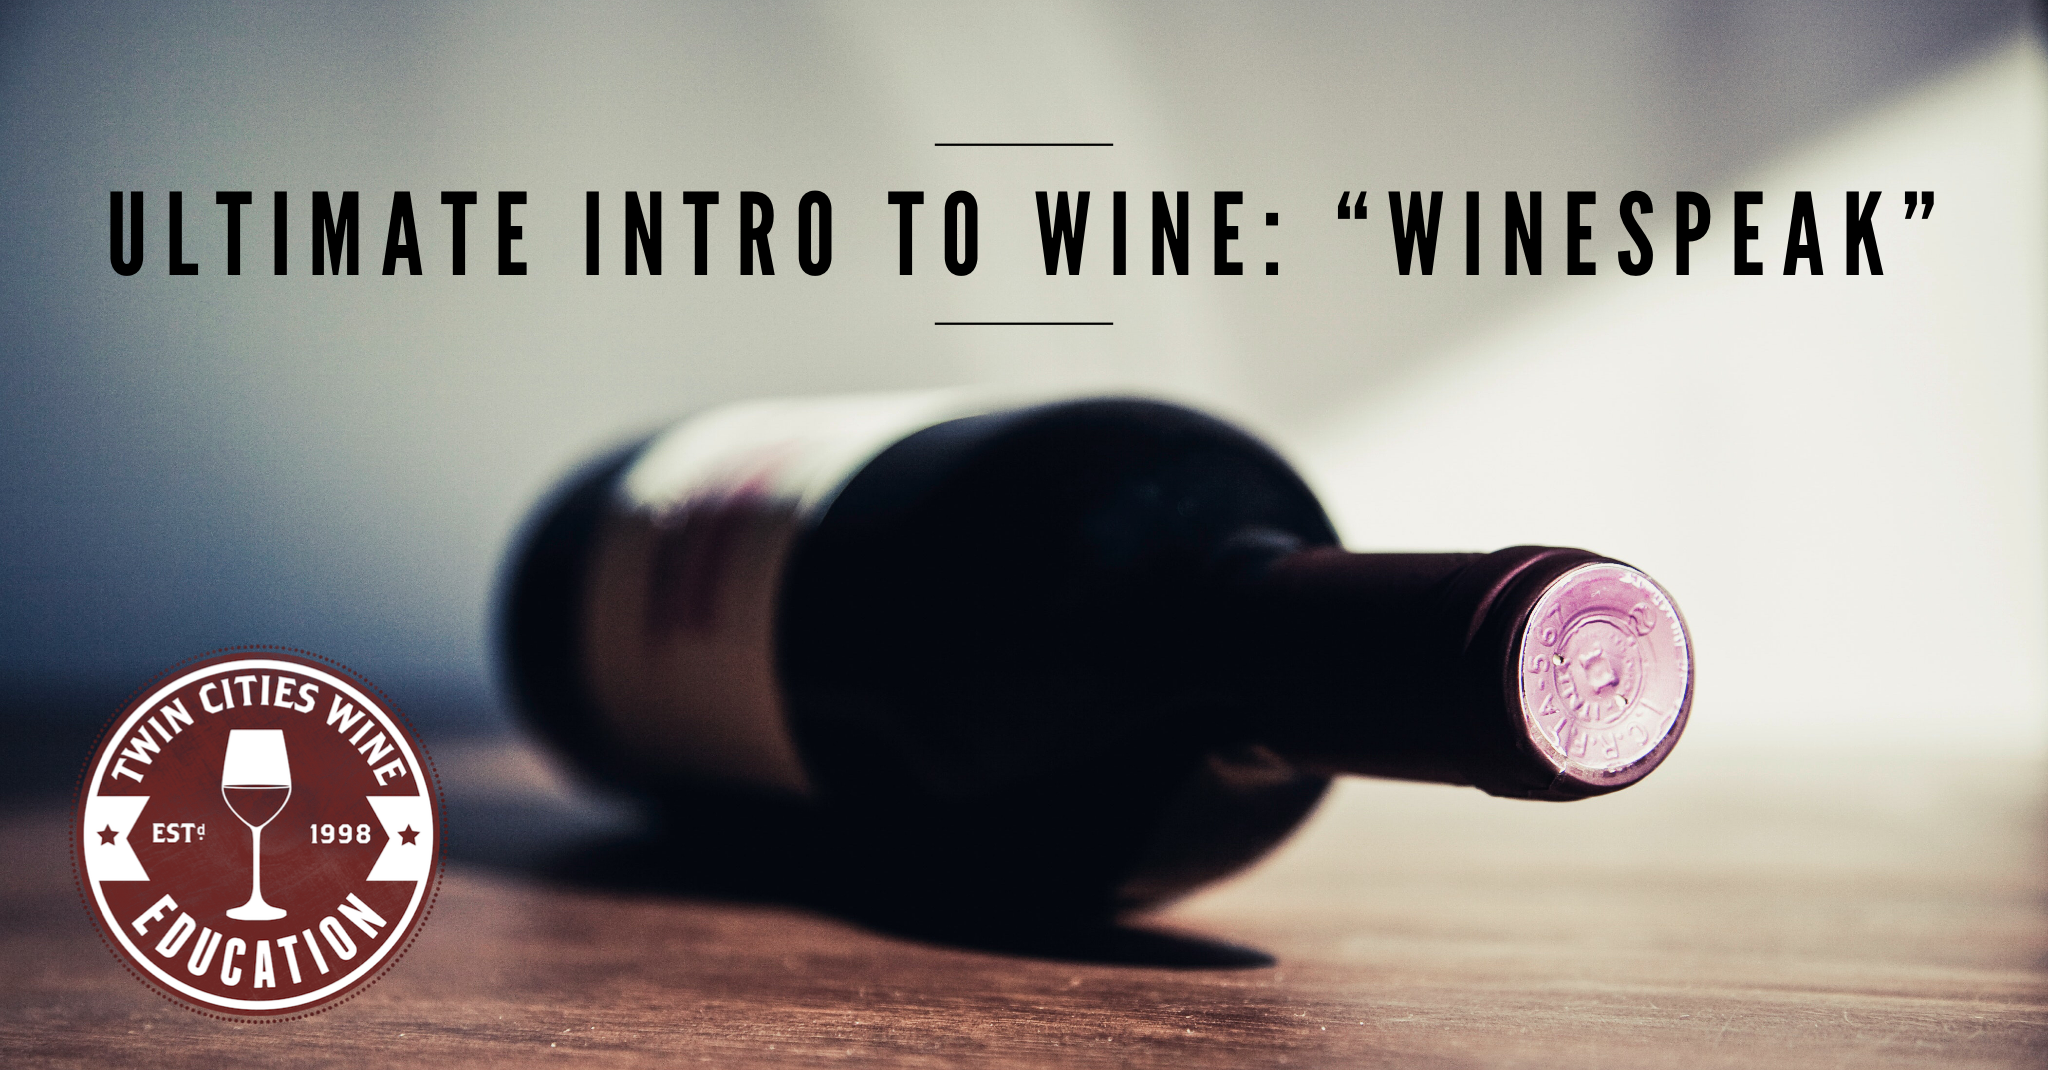 Intro to Wine Series: WINESPEAK (the ultimate intro to wine class)